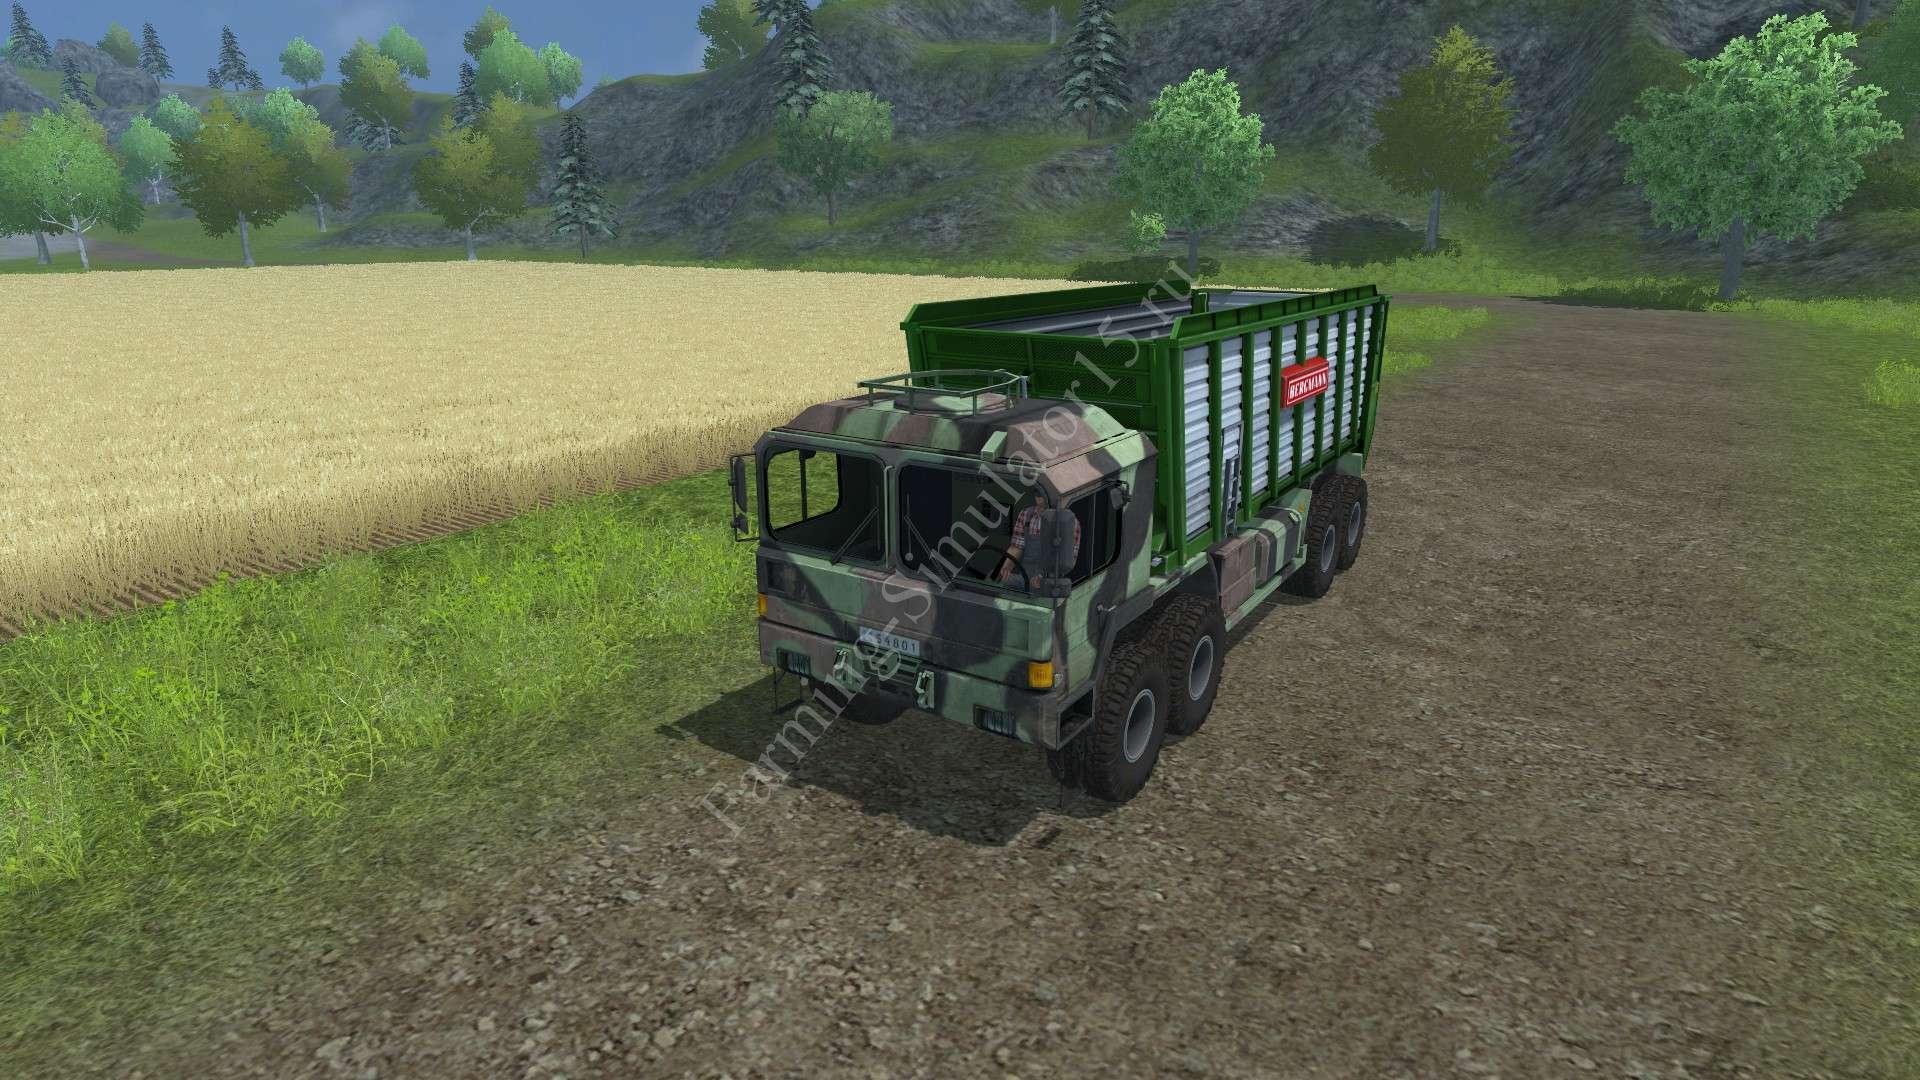 Мод грузовика Man GL 10T v 0.9 Silage Farming Simulator 2013, Farming Simulator 13